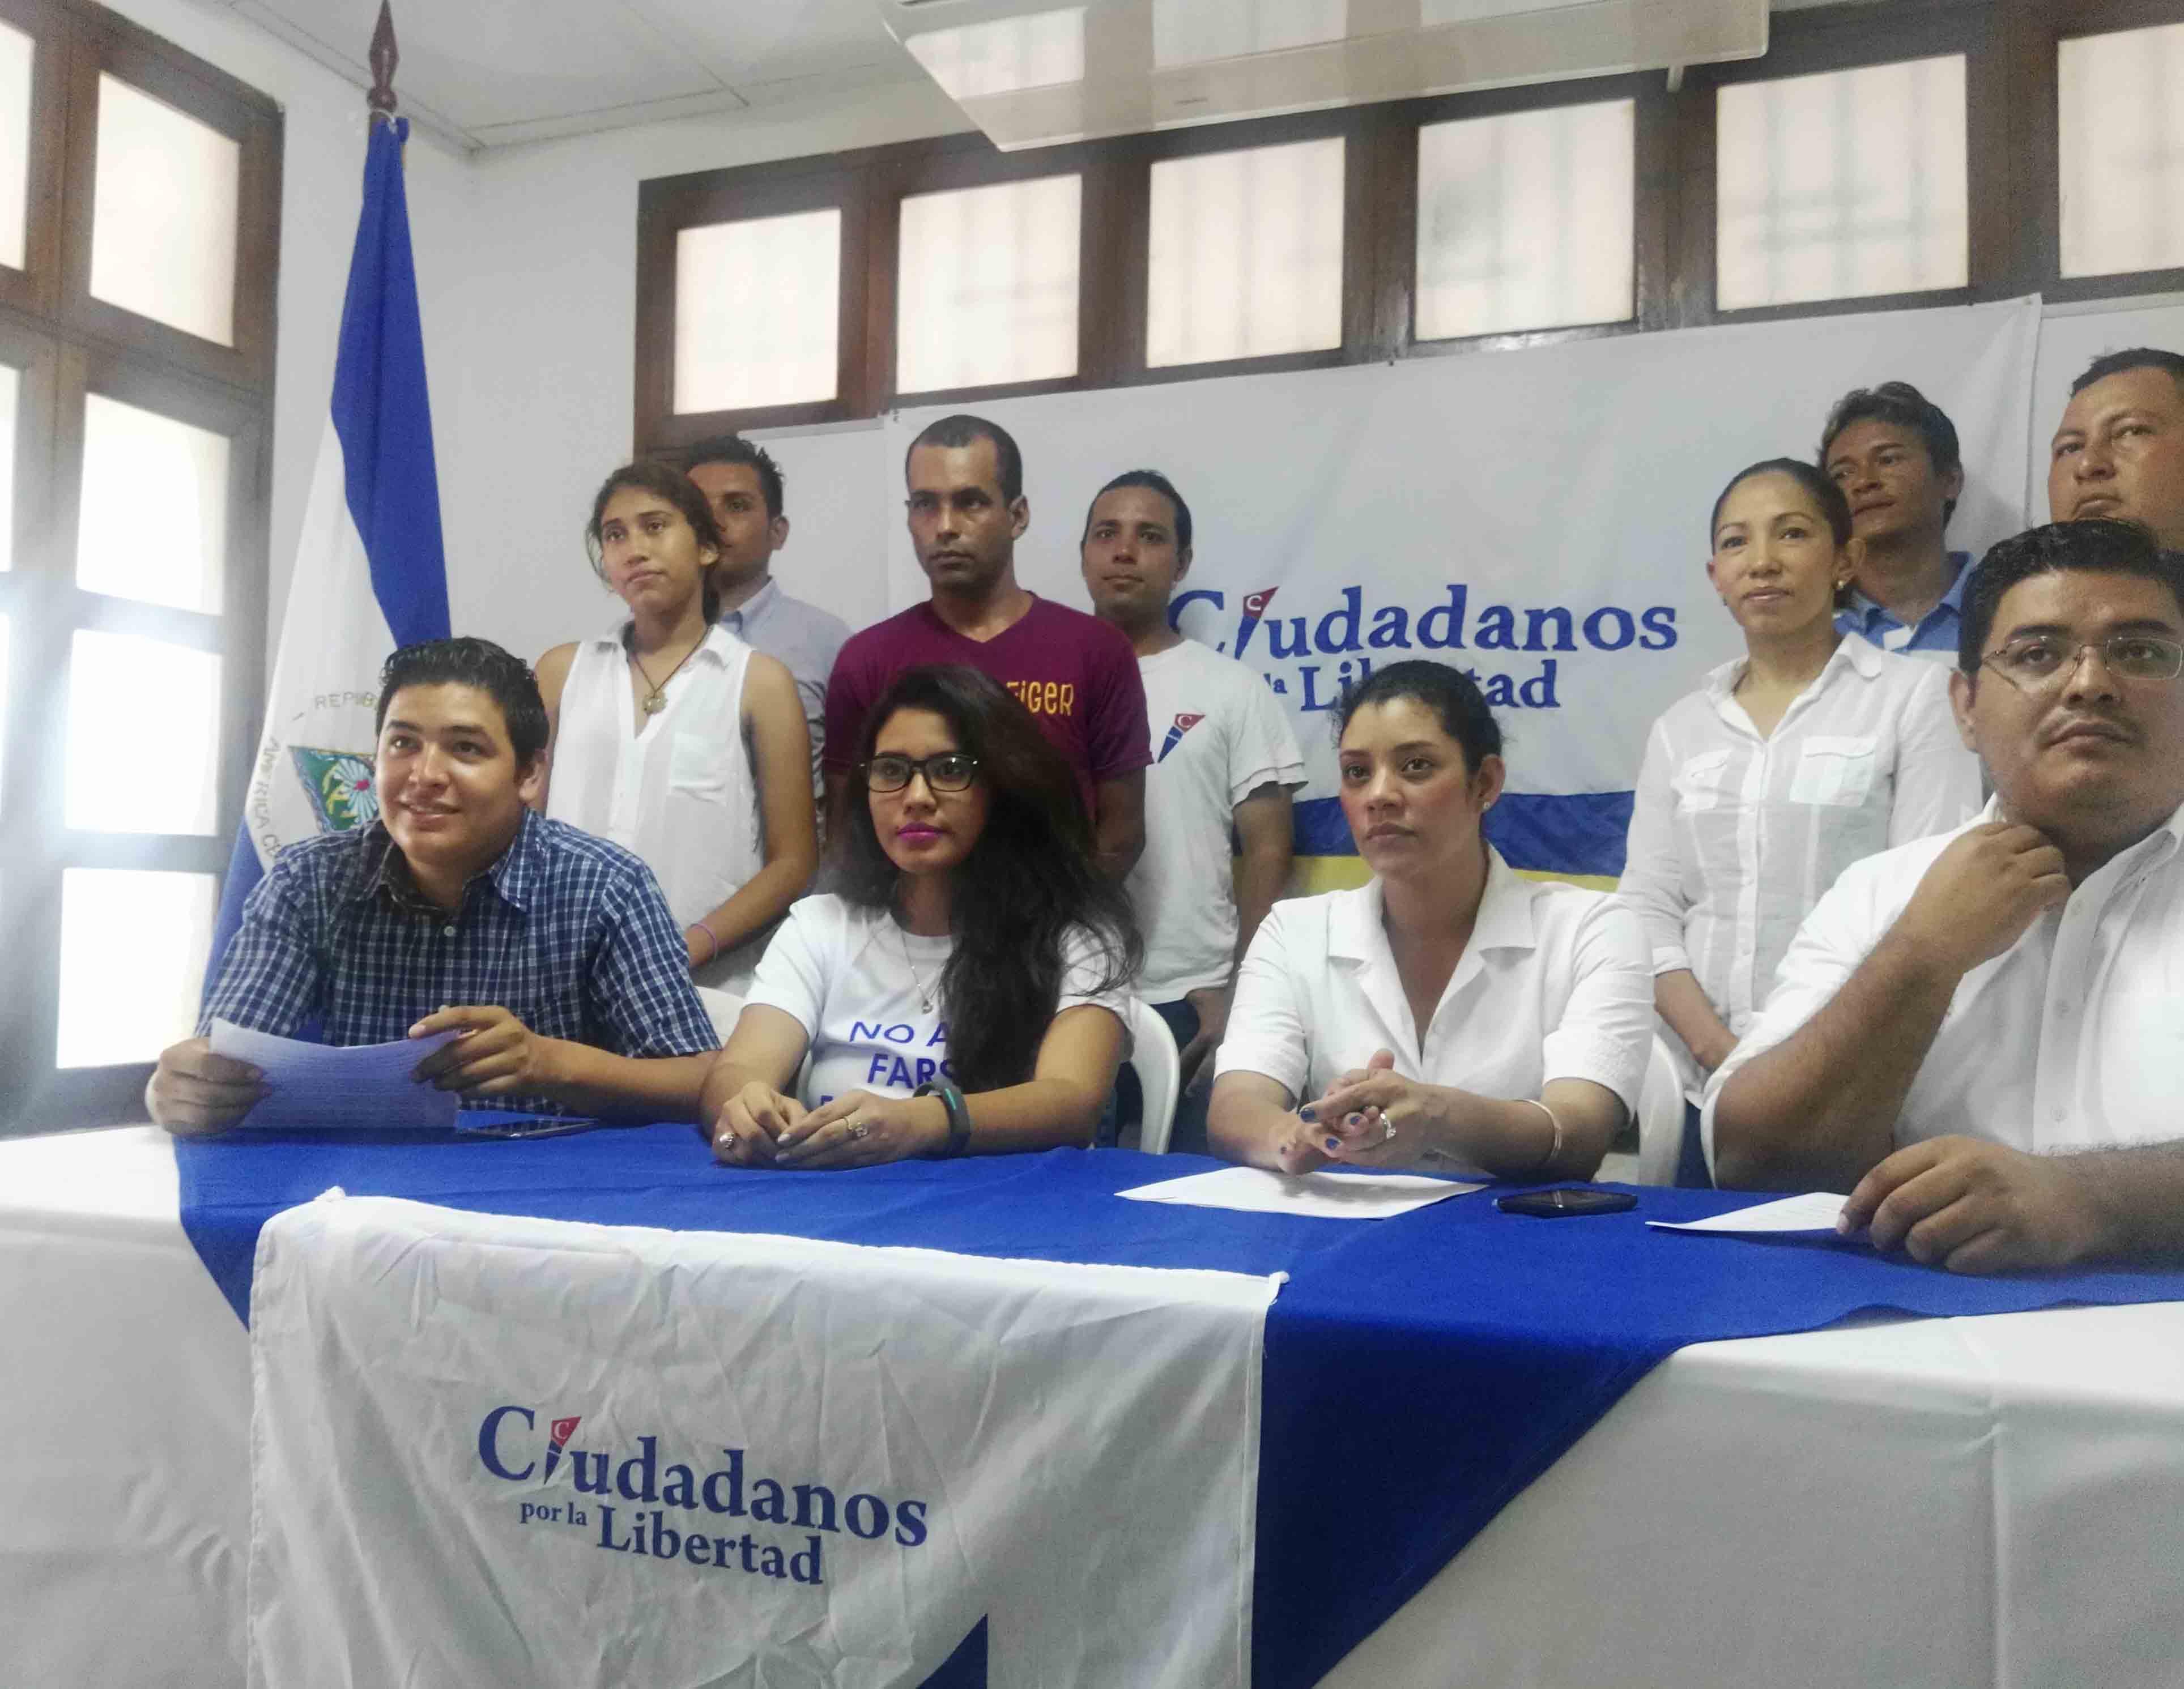 Miembros de Ciudadanos por la Libertad.  FOTO LEONOR ALVAREZ